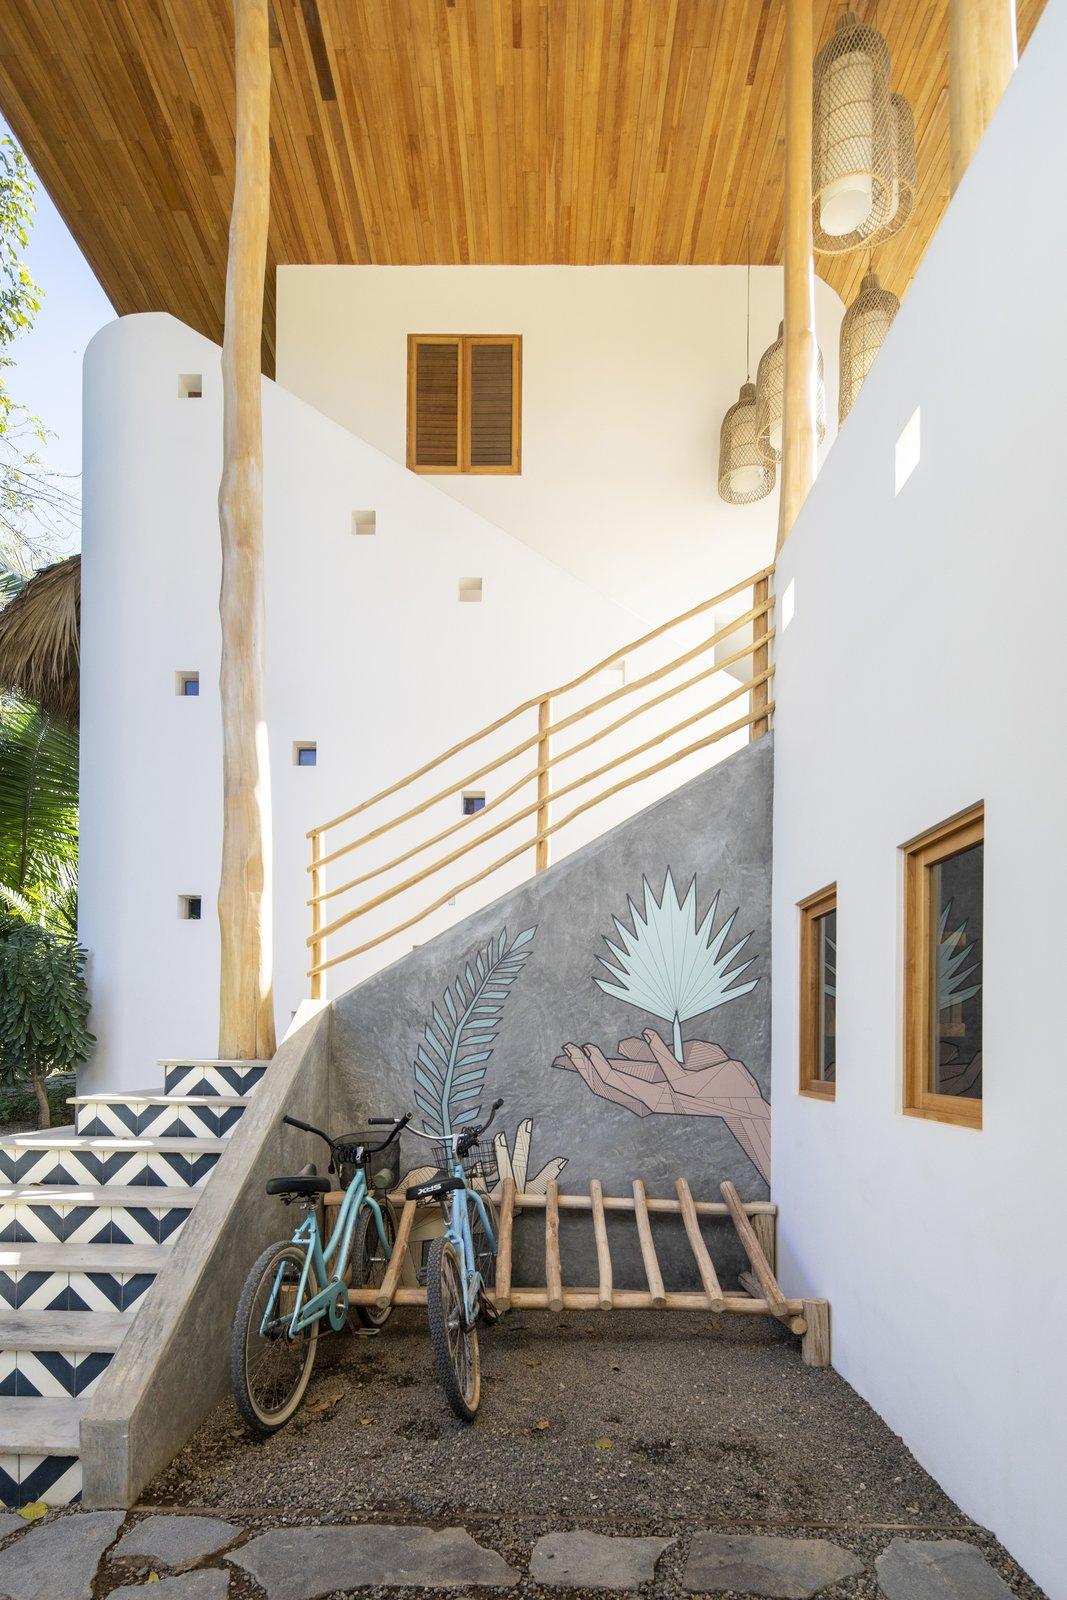 Beach House Building Type, Metal Roof Material, Concrete Siding Material, and Flat RoofLine Bike rack   Nomadic Nosara